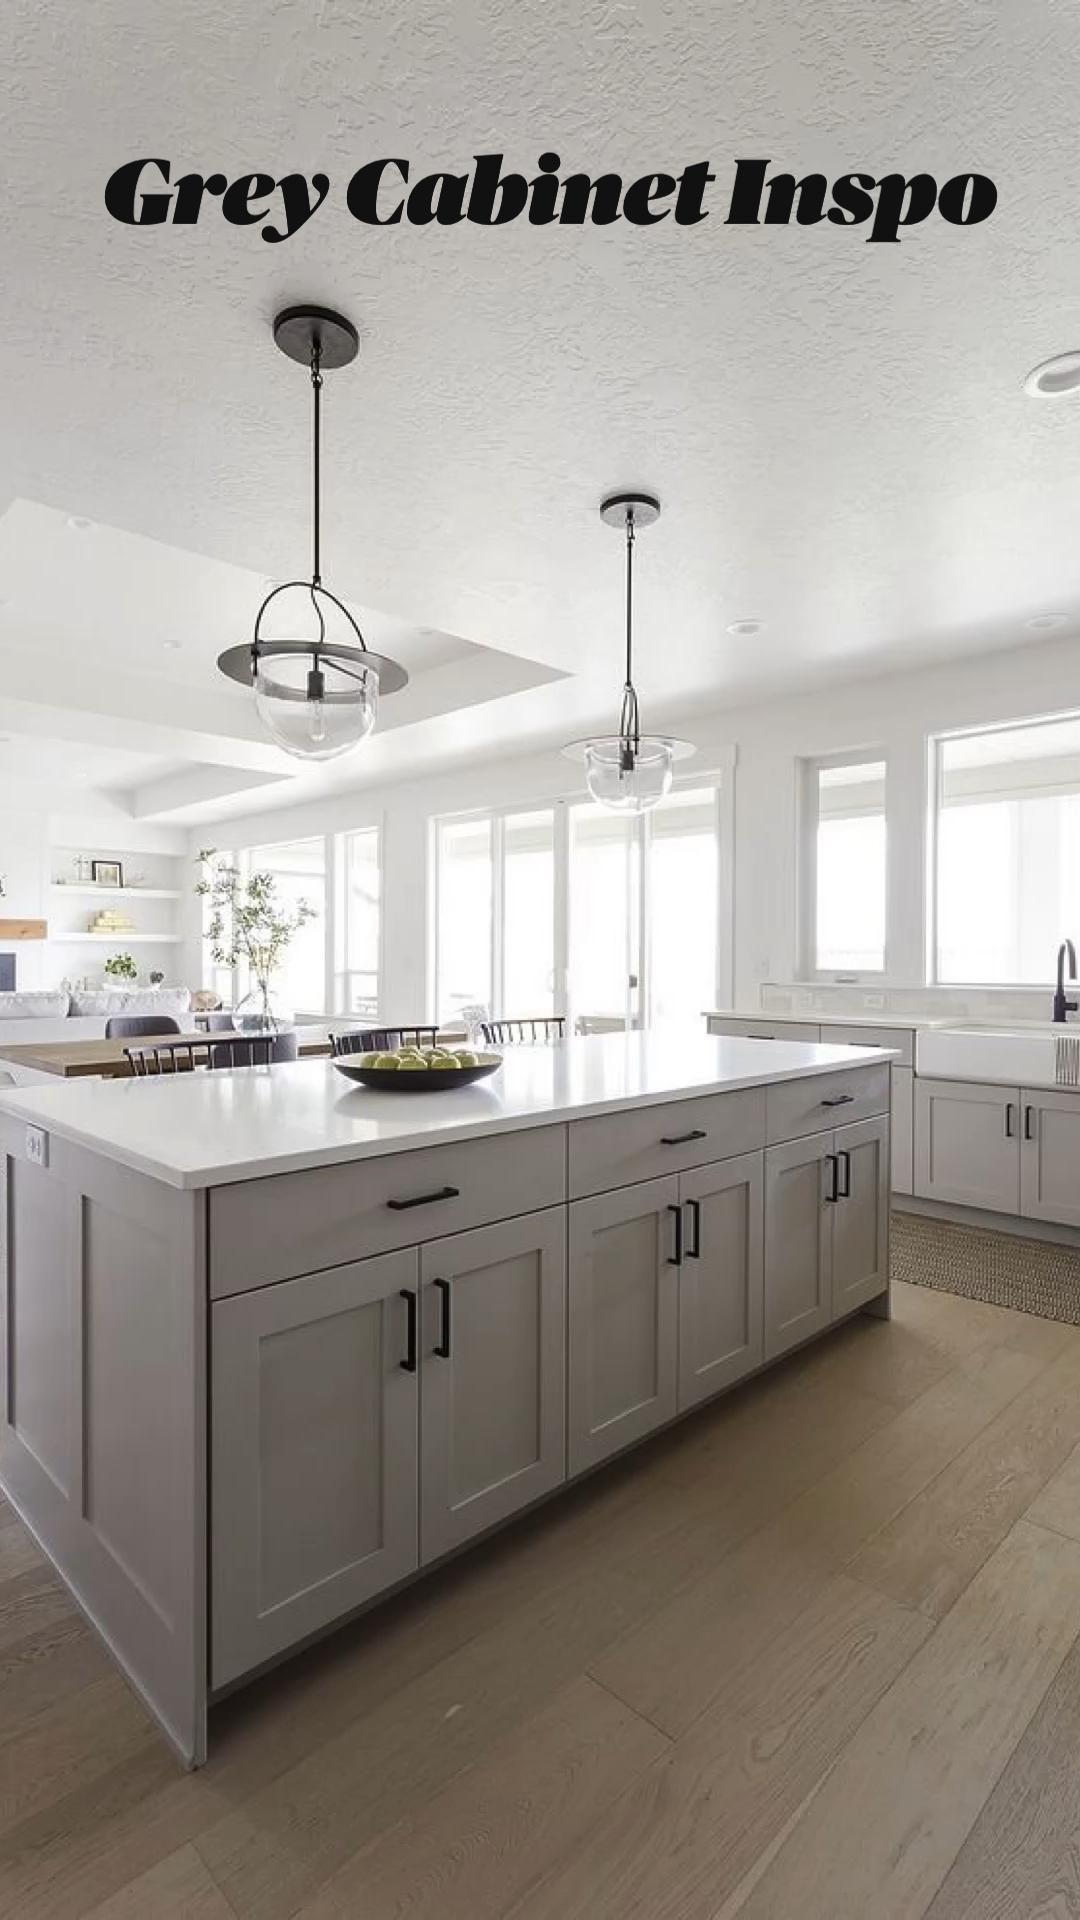 New-Construction Interior Design Ideas